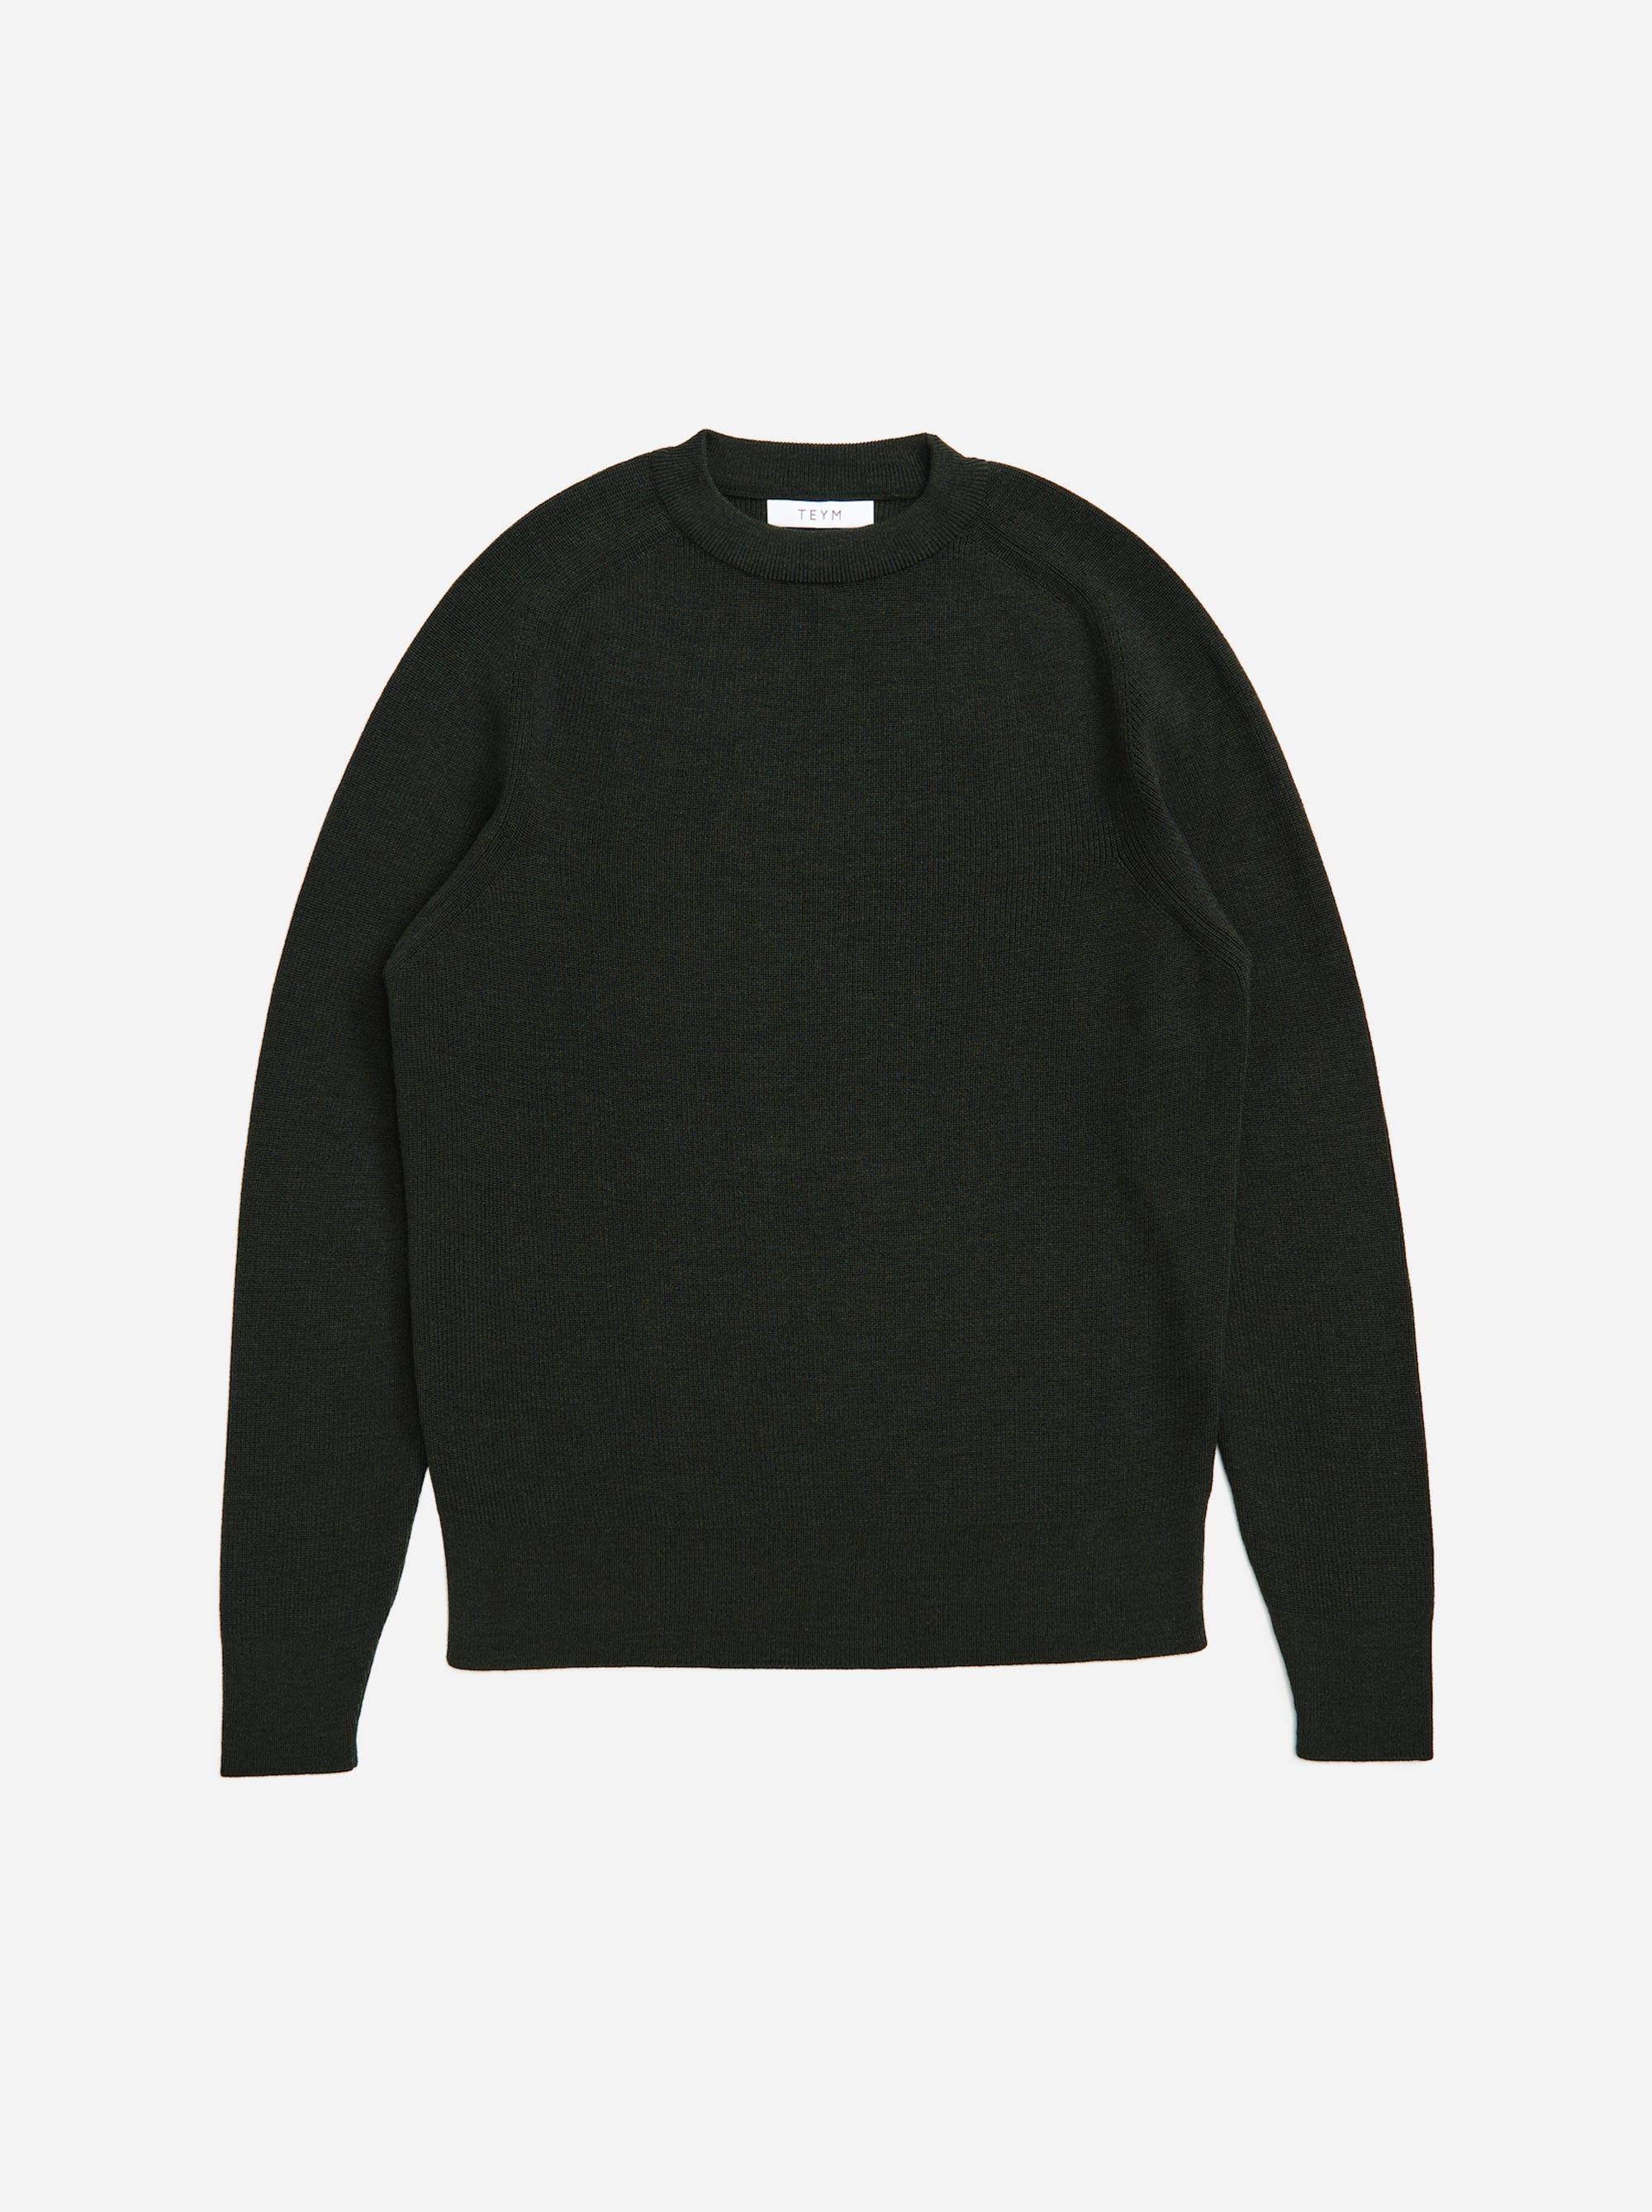 Teym - Crewneck - The Merino Sweater - Women - Green - 4